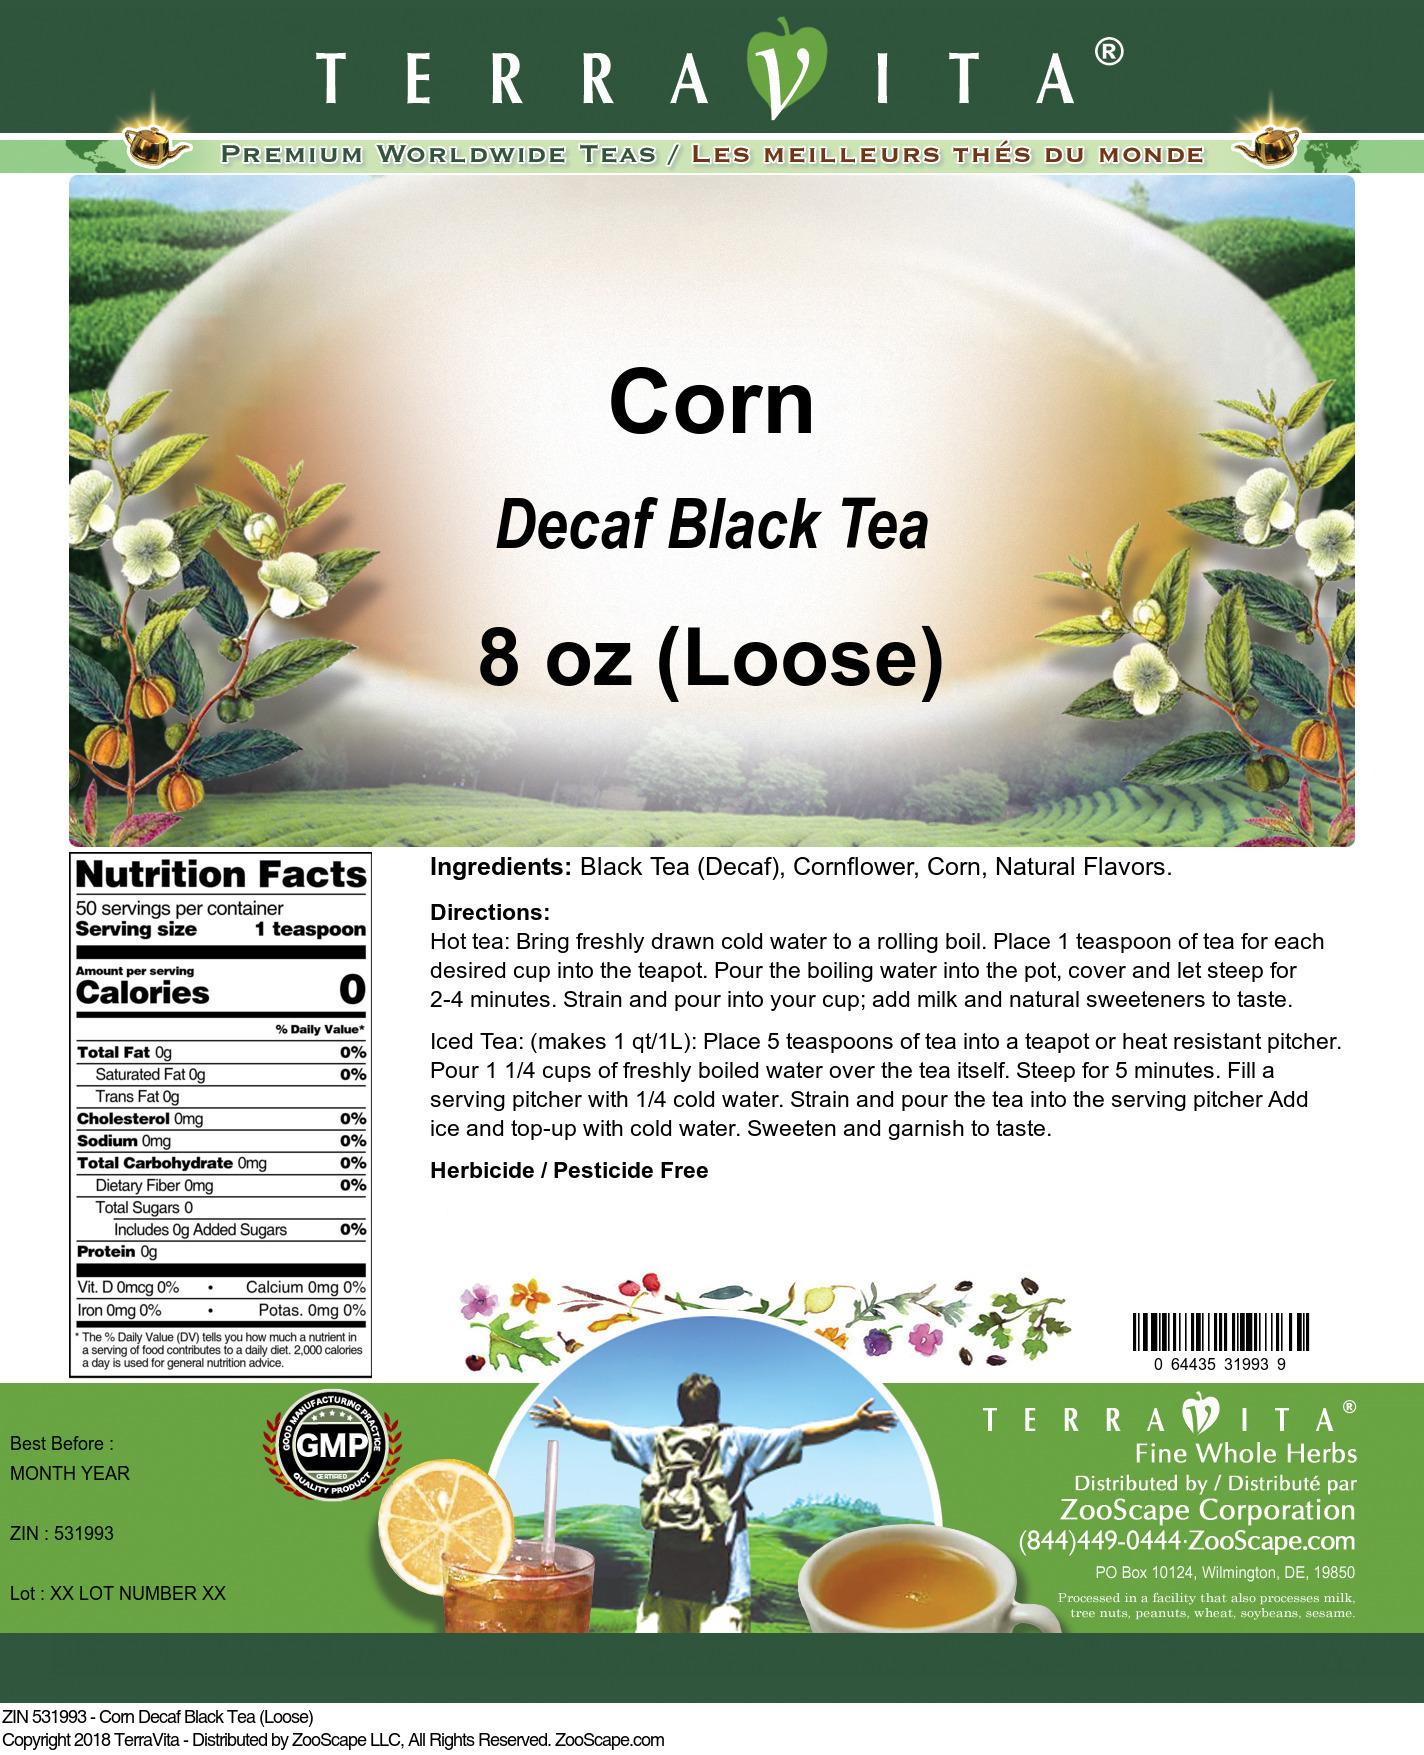 Corn Decaf Black Tea